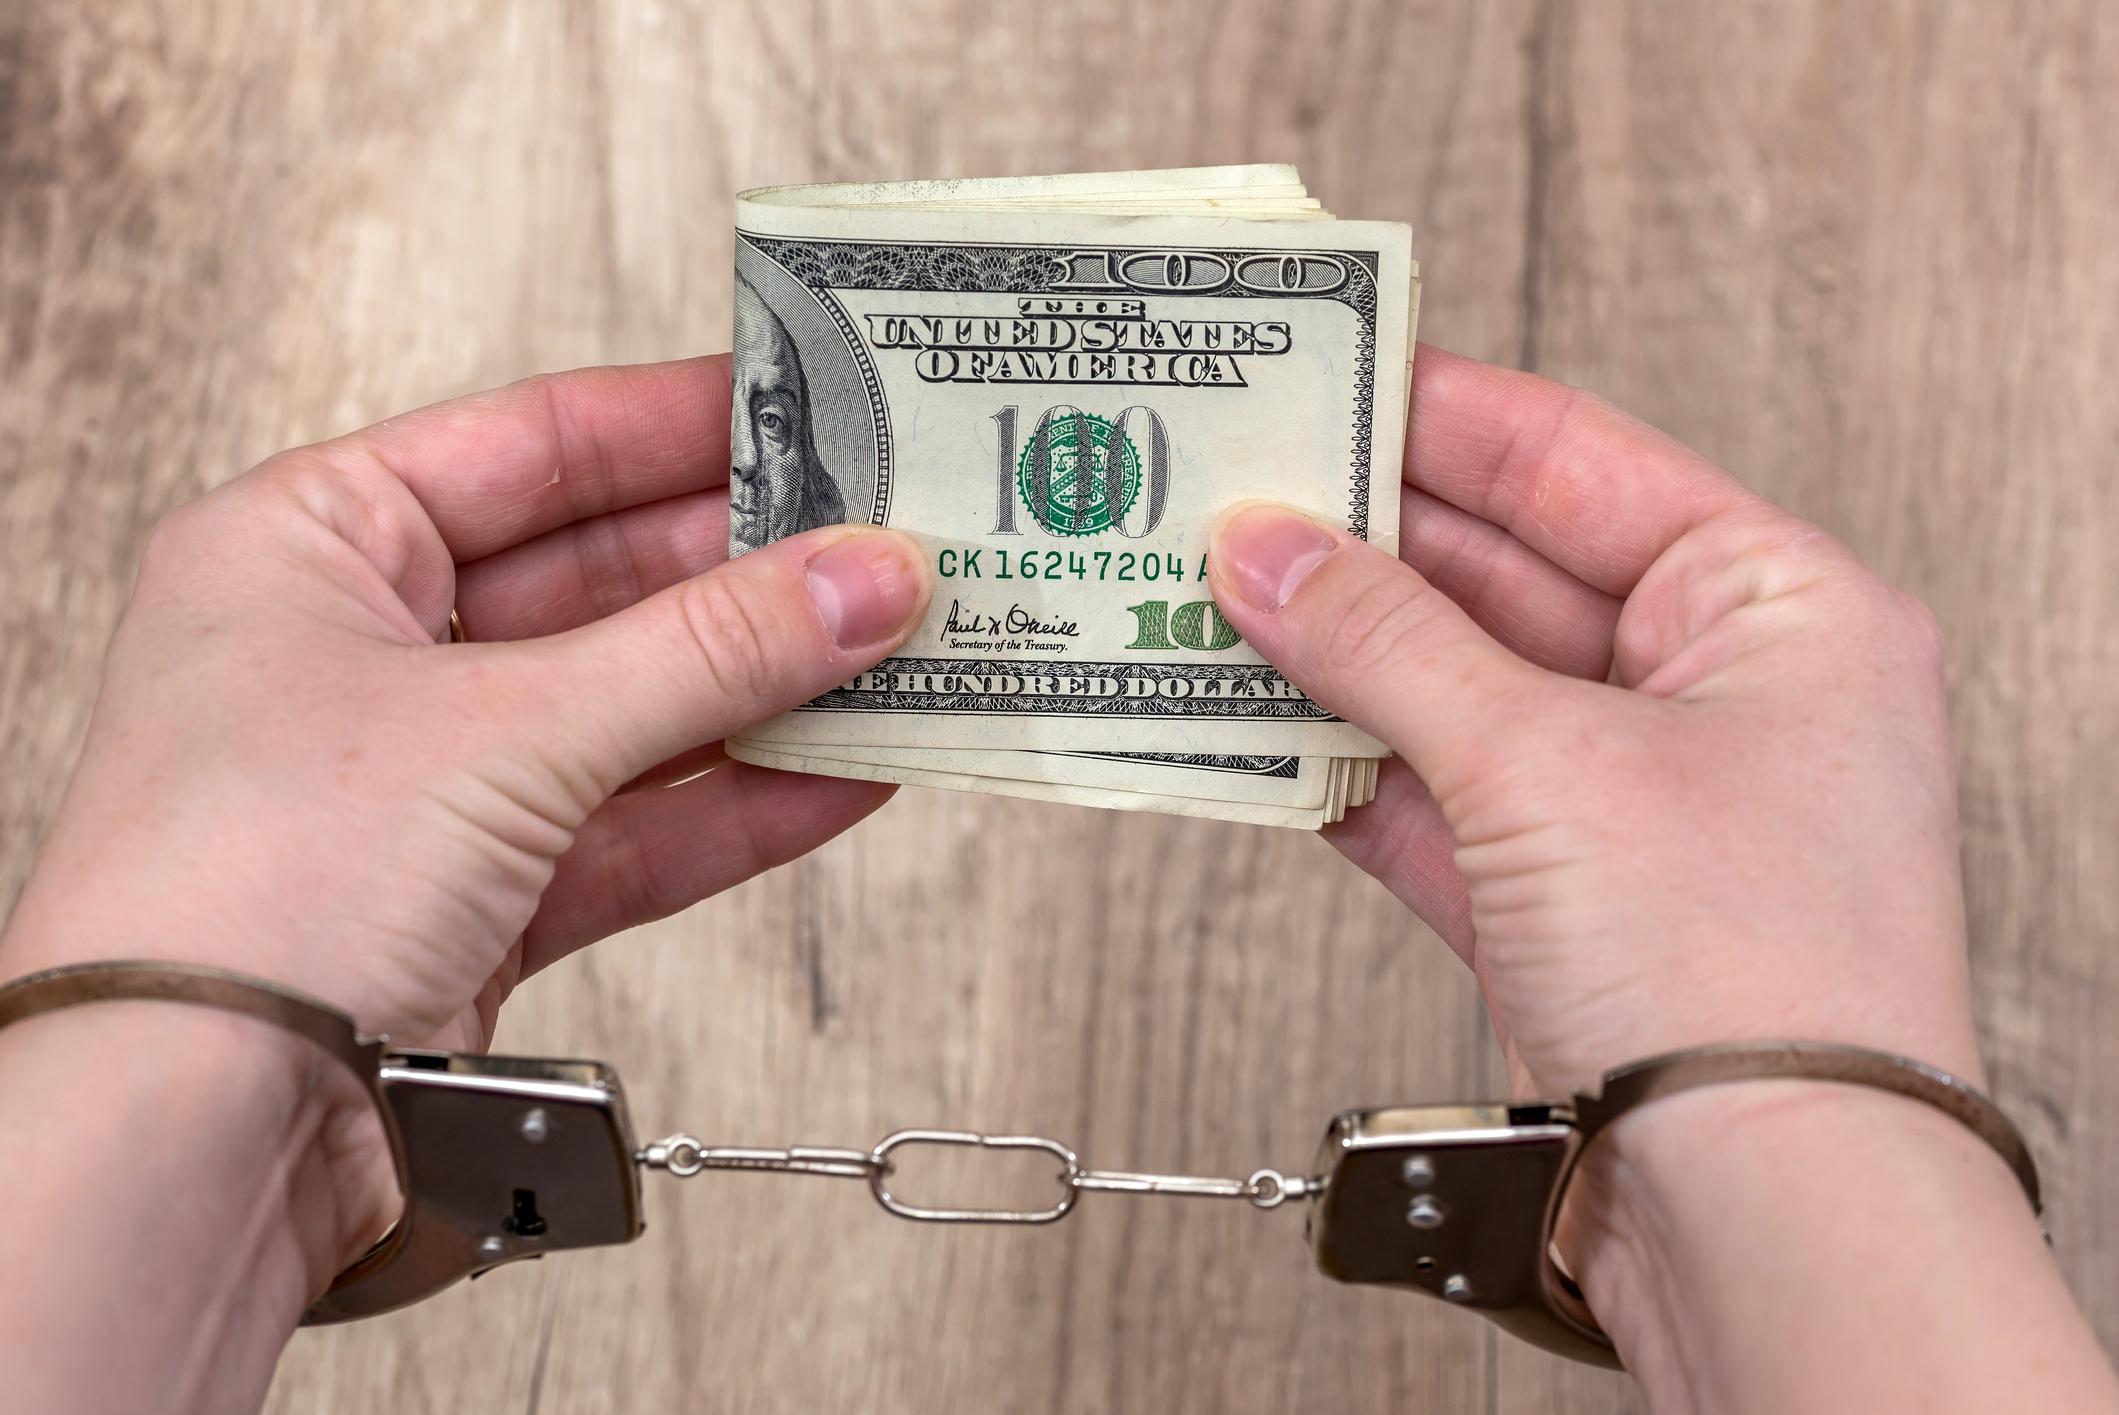 Embezzlement - Complete Controller